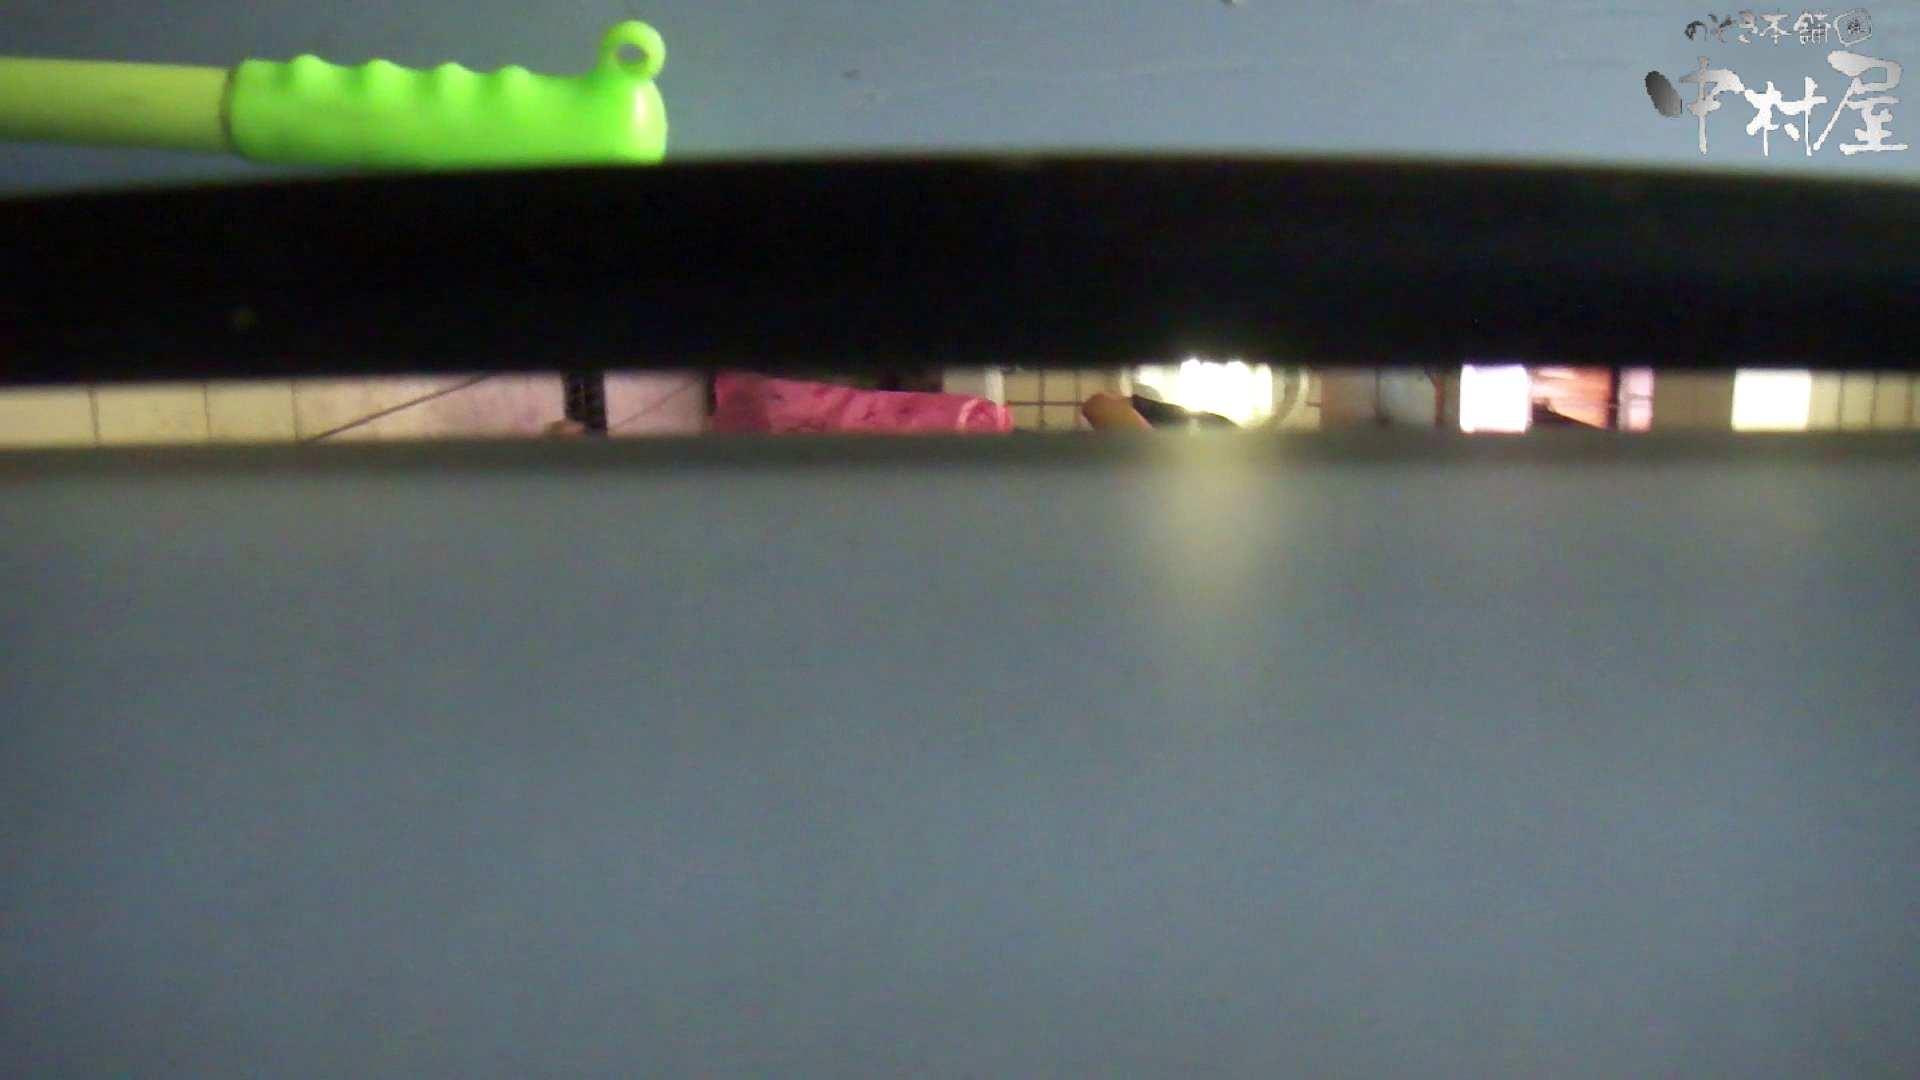 GOD HAND 芸術大学盗撮‼vol.79 OLのエロ生活 隠し撮りオマンコ動画紹介 107連発 66